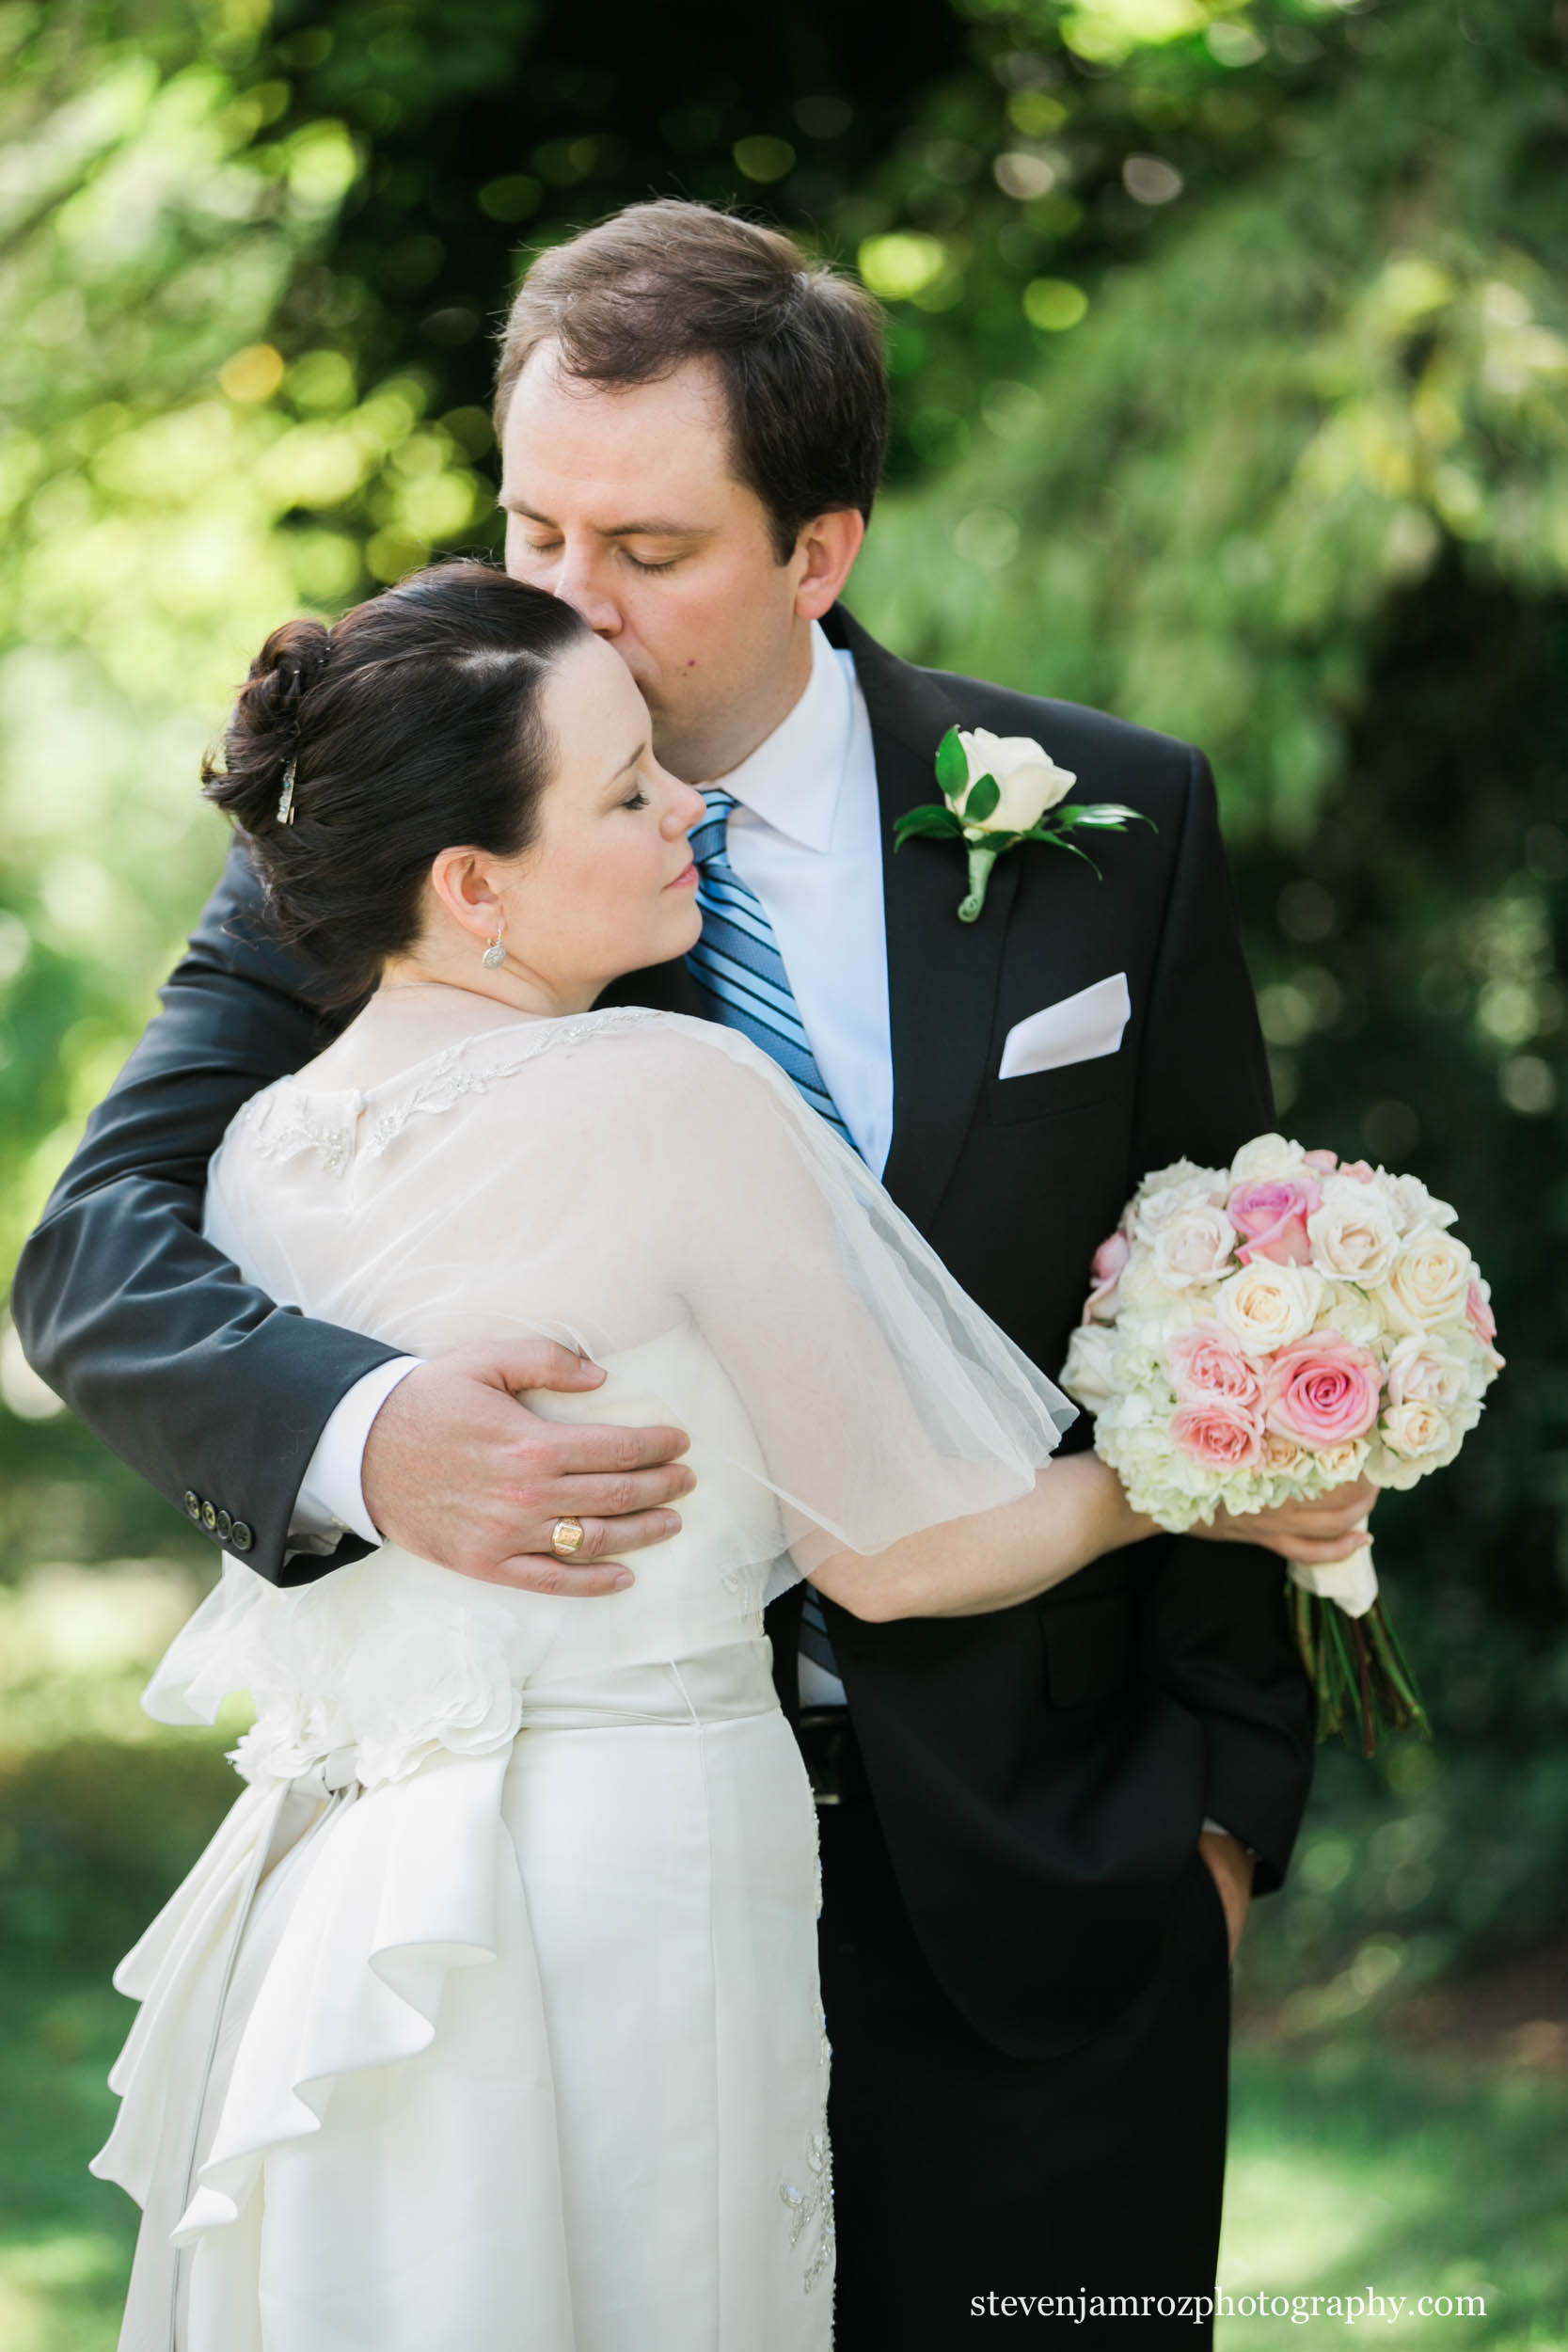 bouquet-bride-and-groom-steven-jamroz-photography-0460.jpg